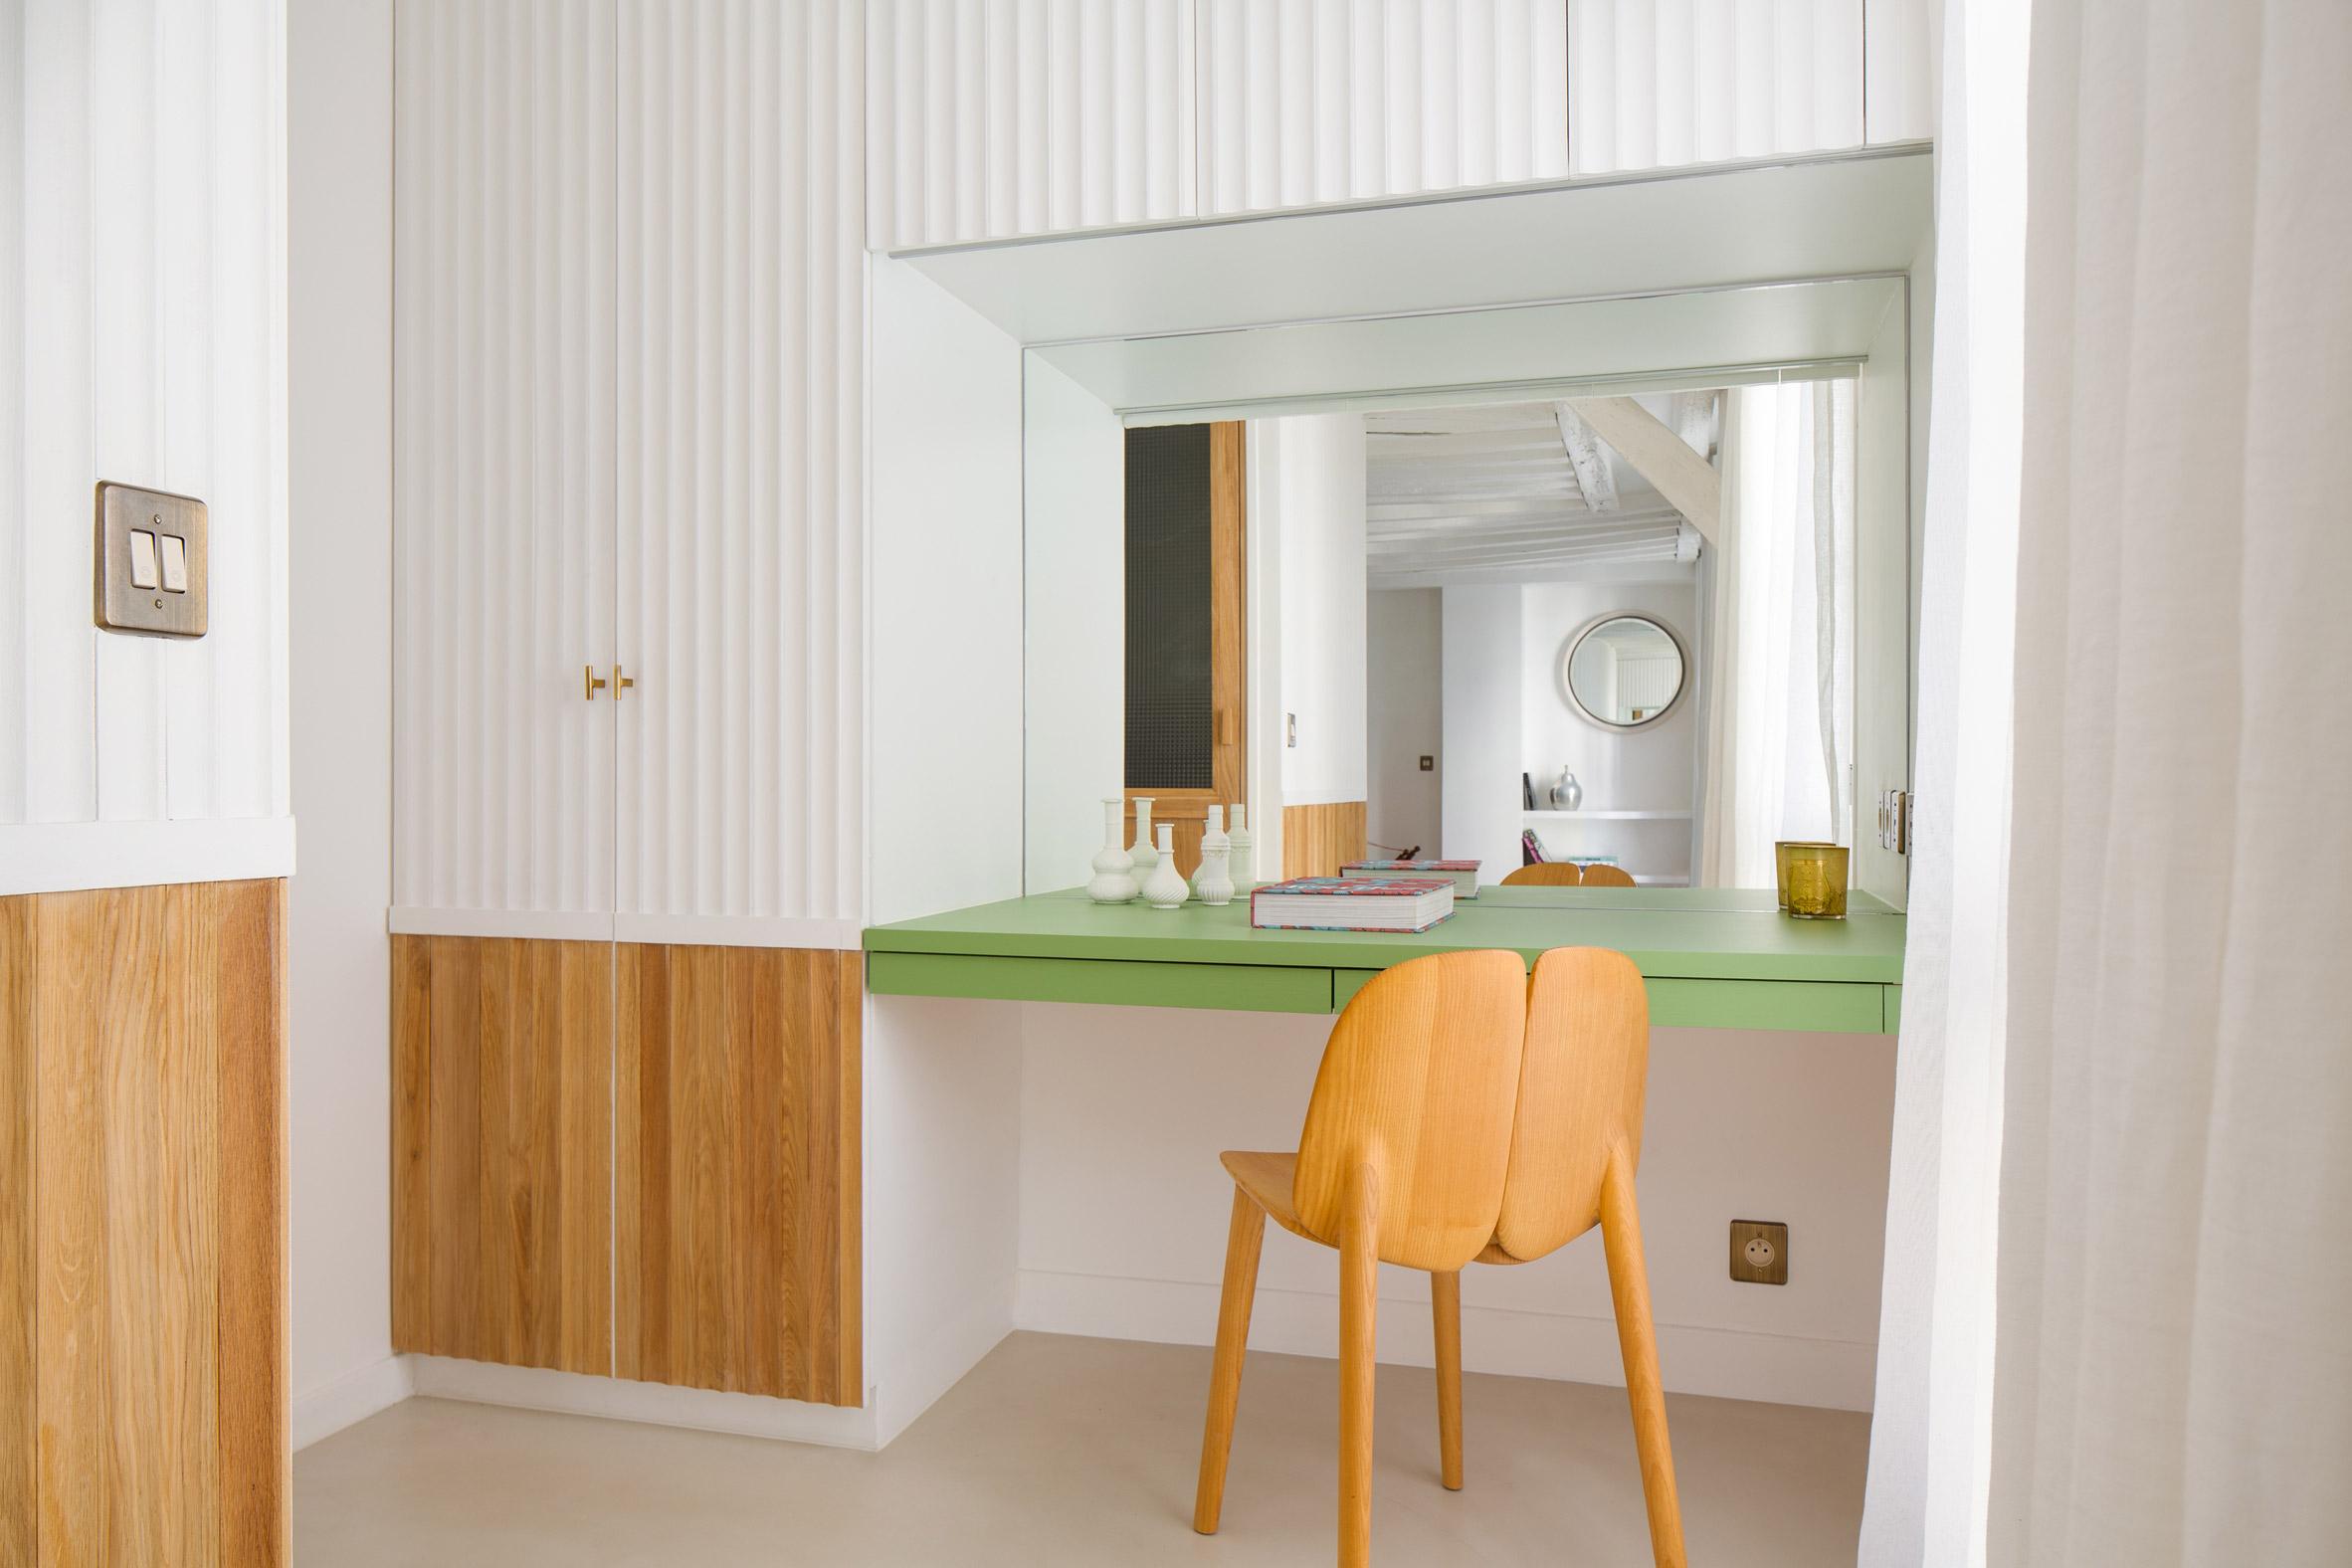 A dresser is built into the wall by Pierre-Louis Gerlier Architecte